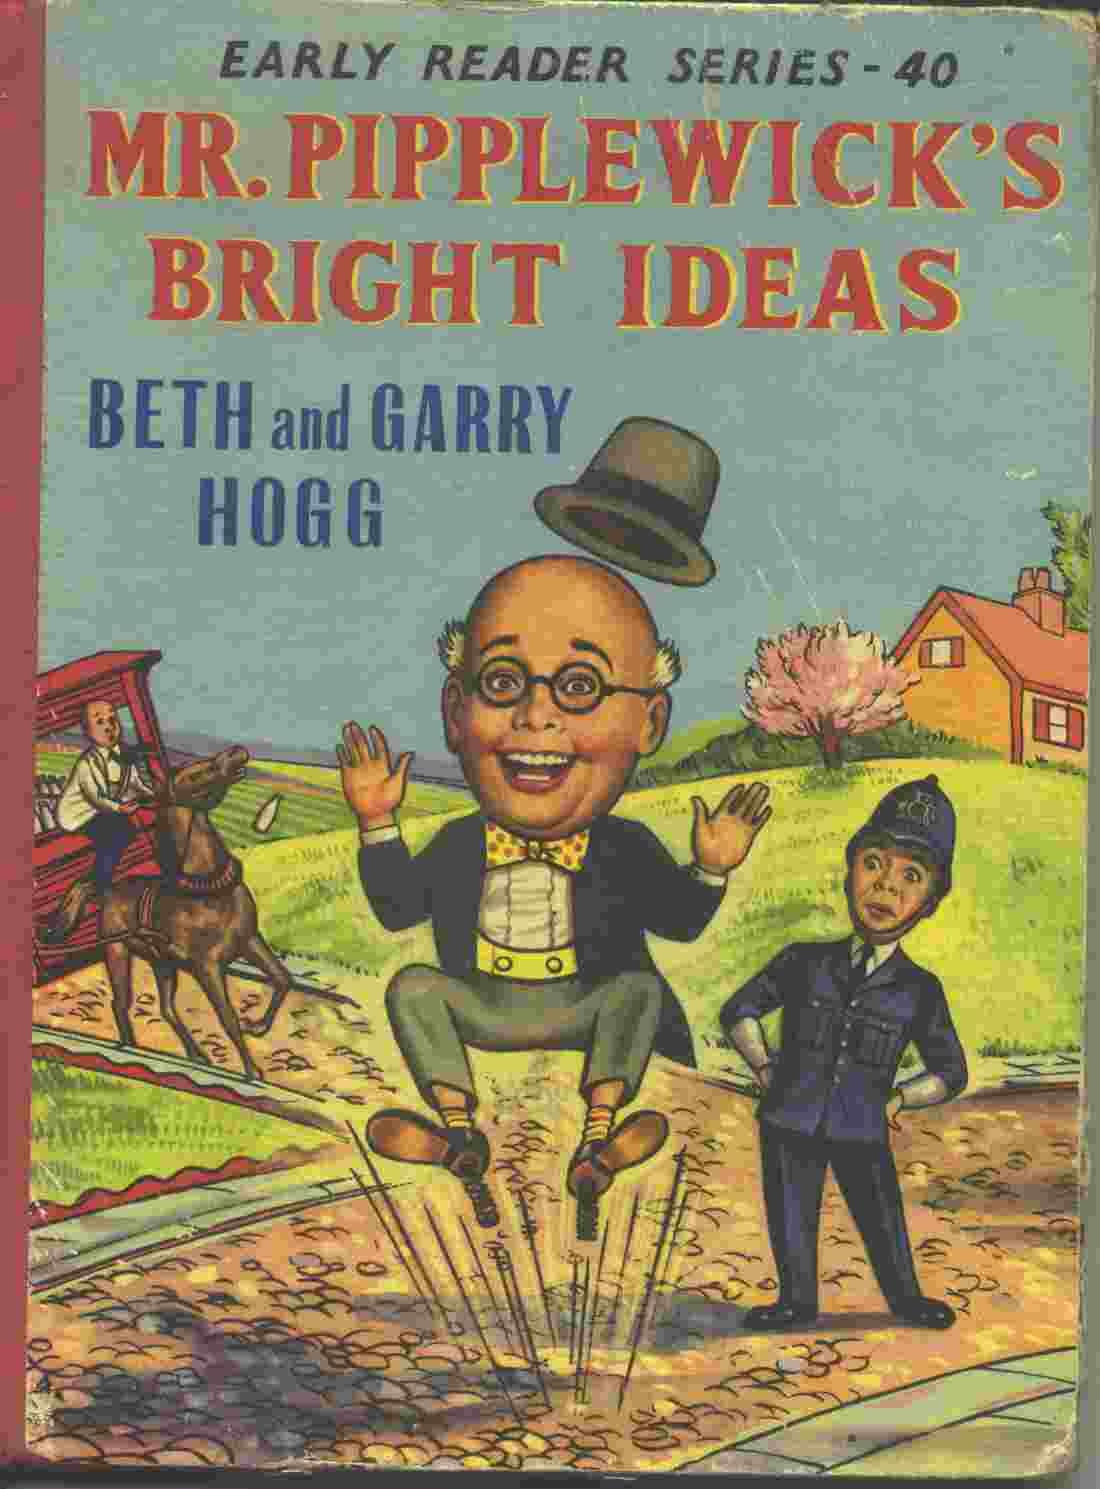 Image for MR. PIPPLEWICK'S BRIGHT IDEAS